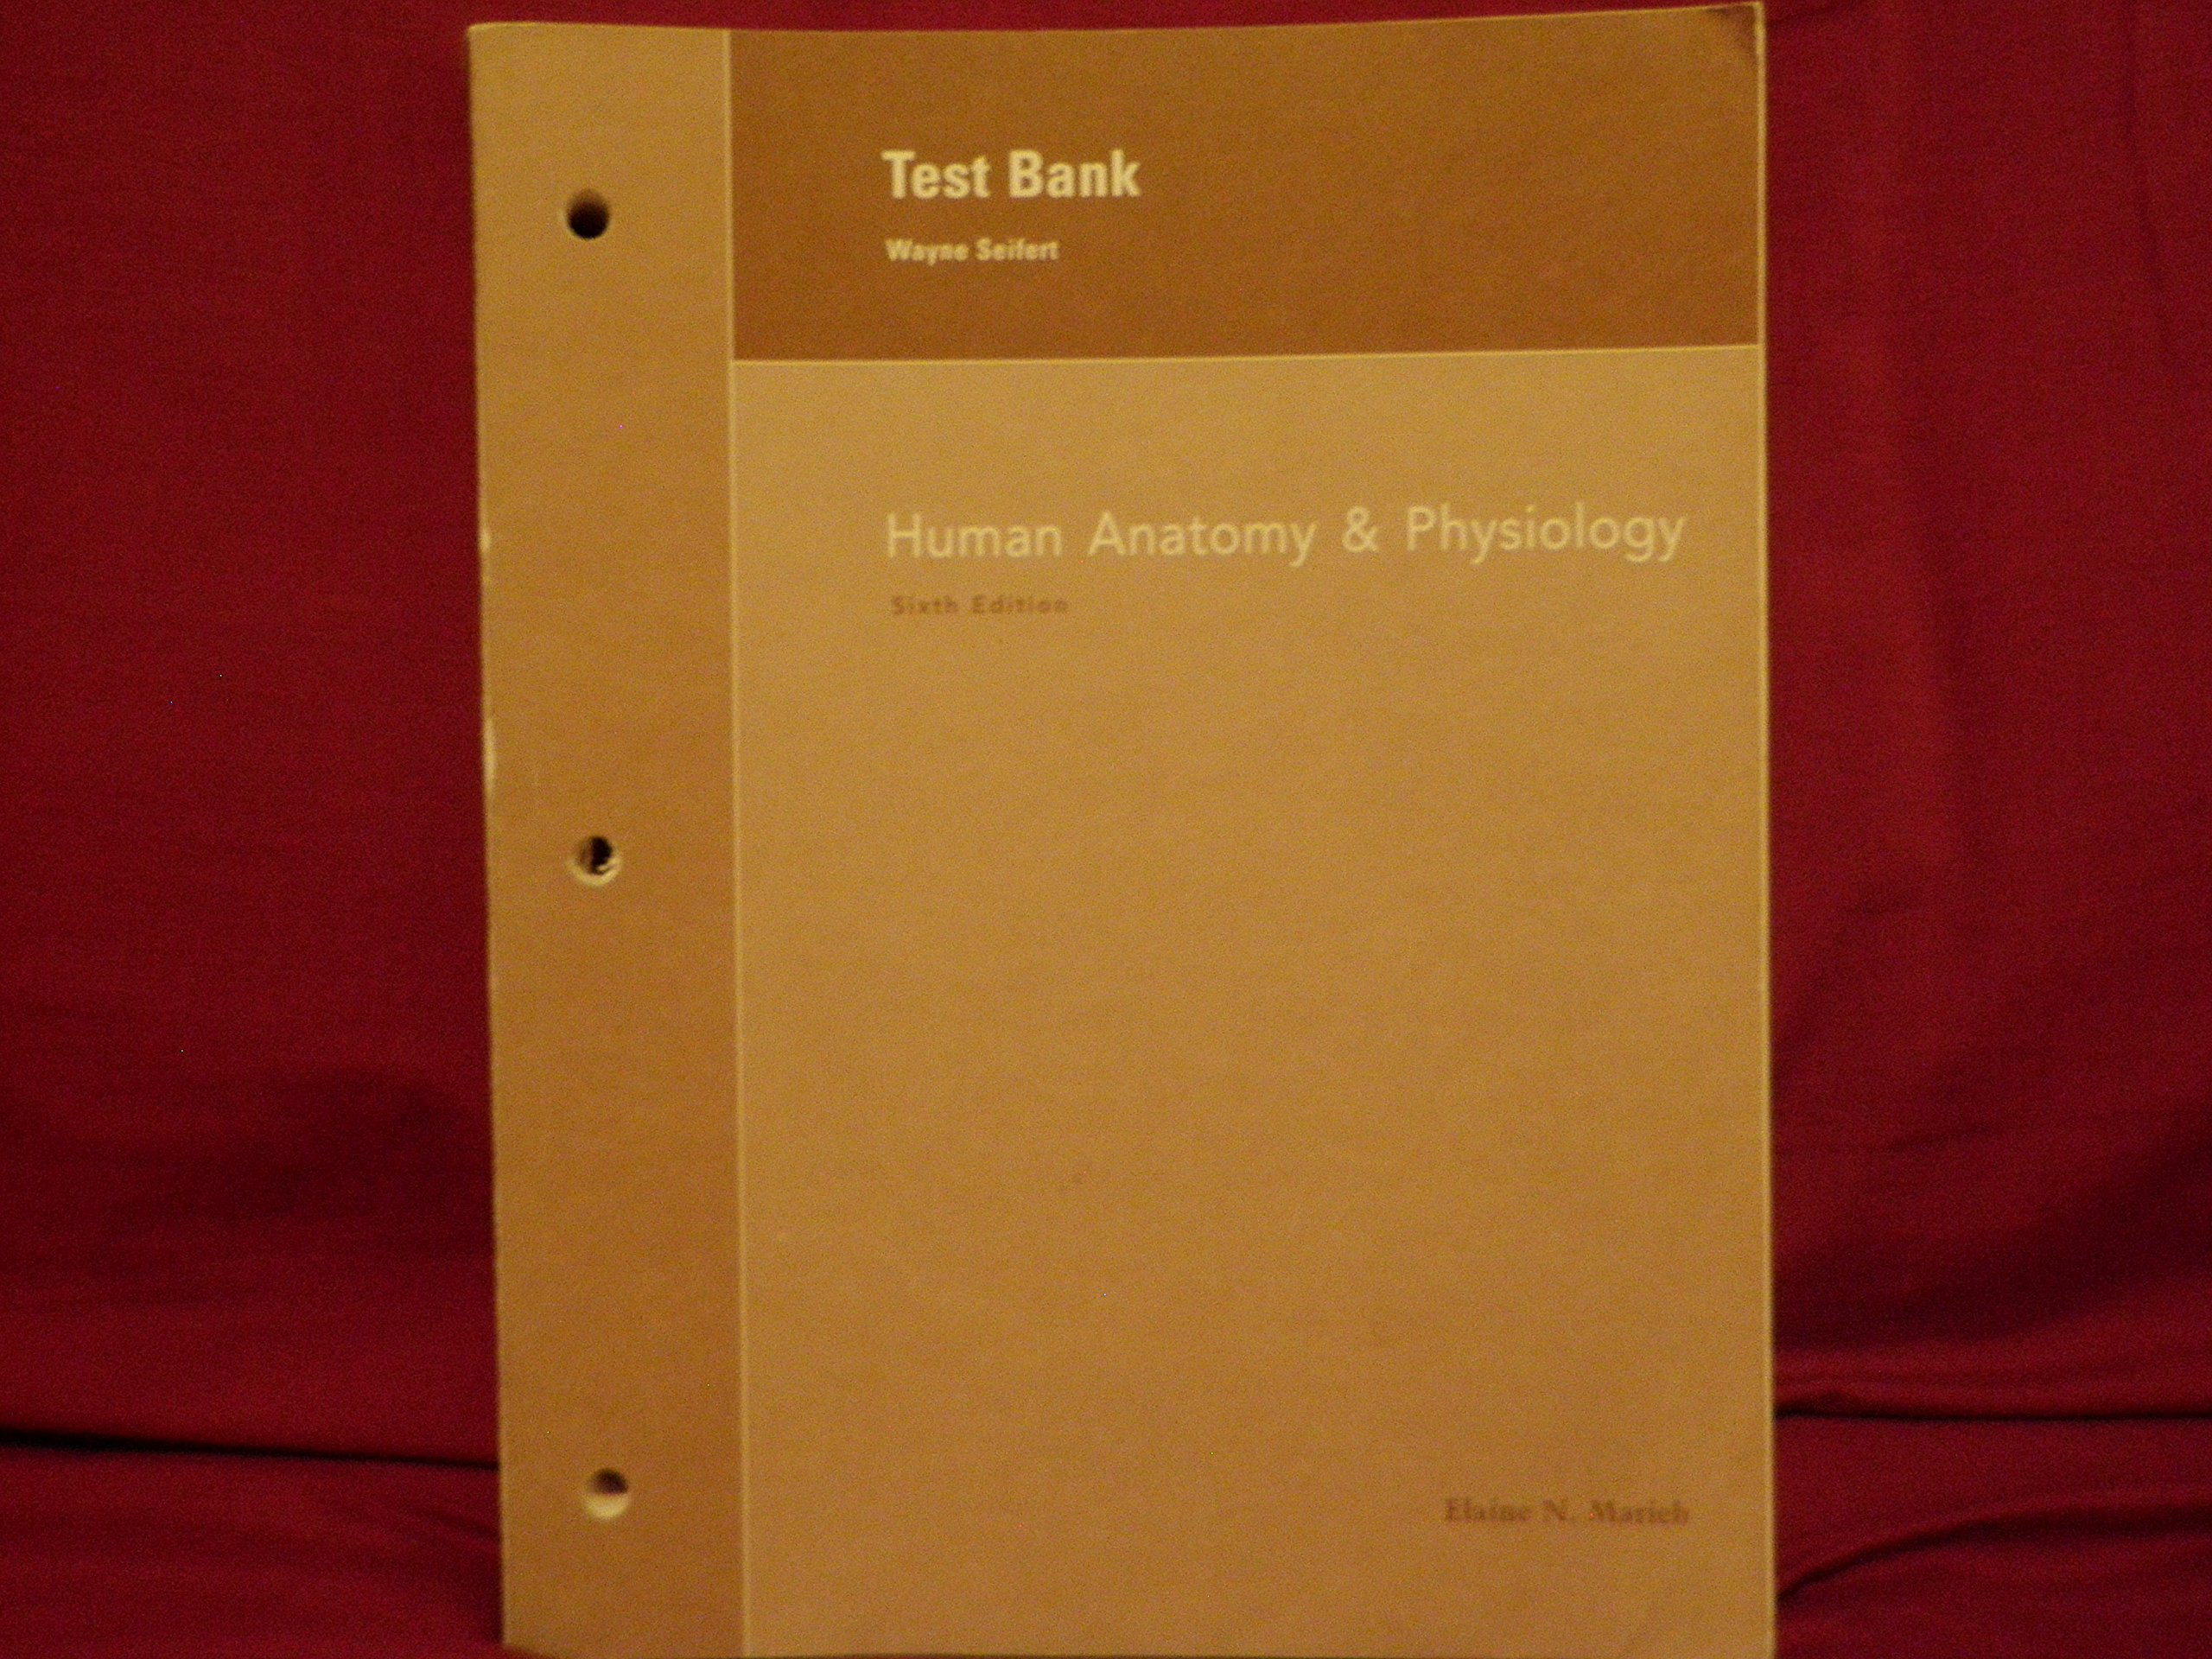 Test Bank Human Anatomy & Physiology: Seifert. Marieb: 9780805354676 ...